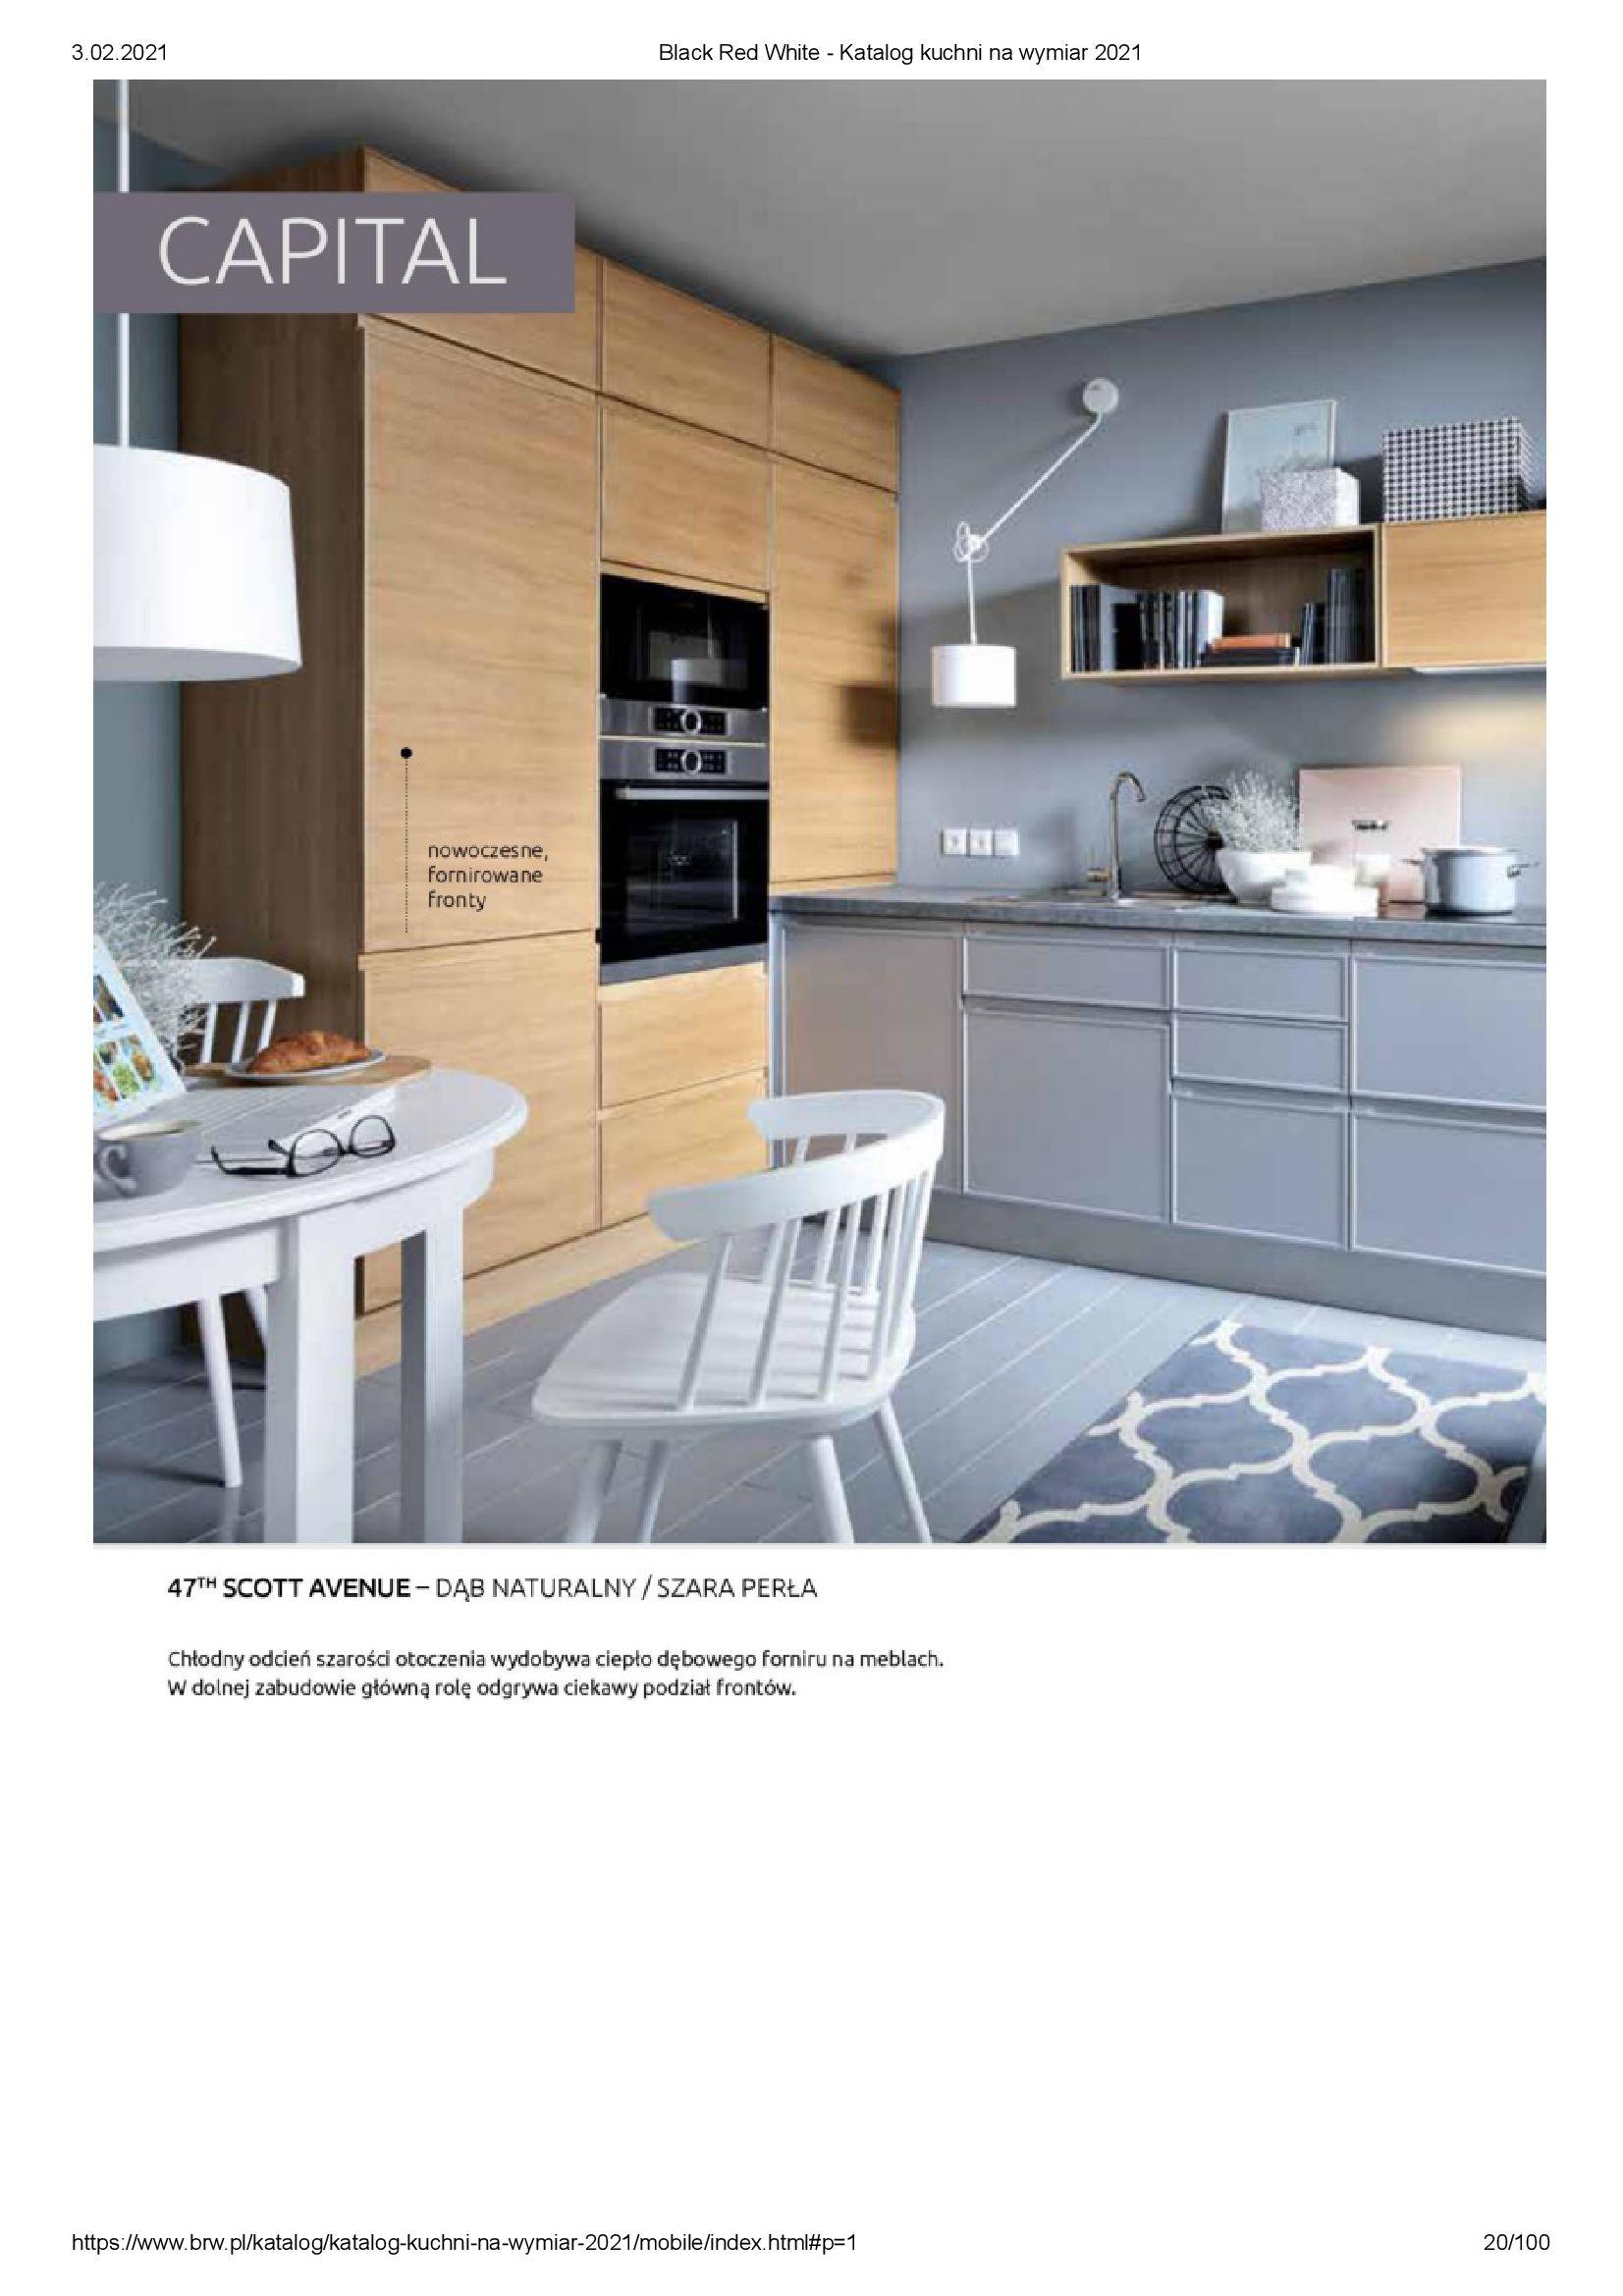 Gazetka Black Red White: Katalog - Kuchnie na wymiar Senso Kitchens 2021 2021-01-01 page-20